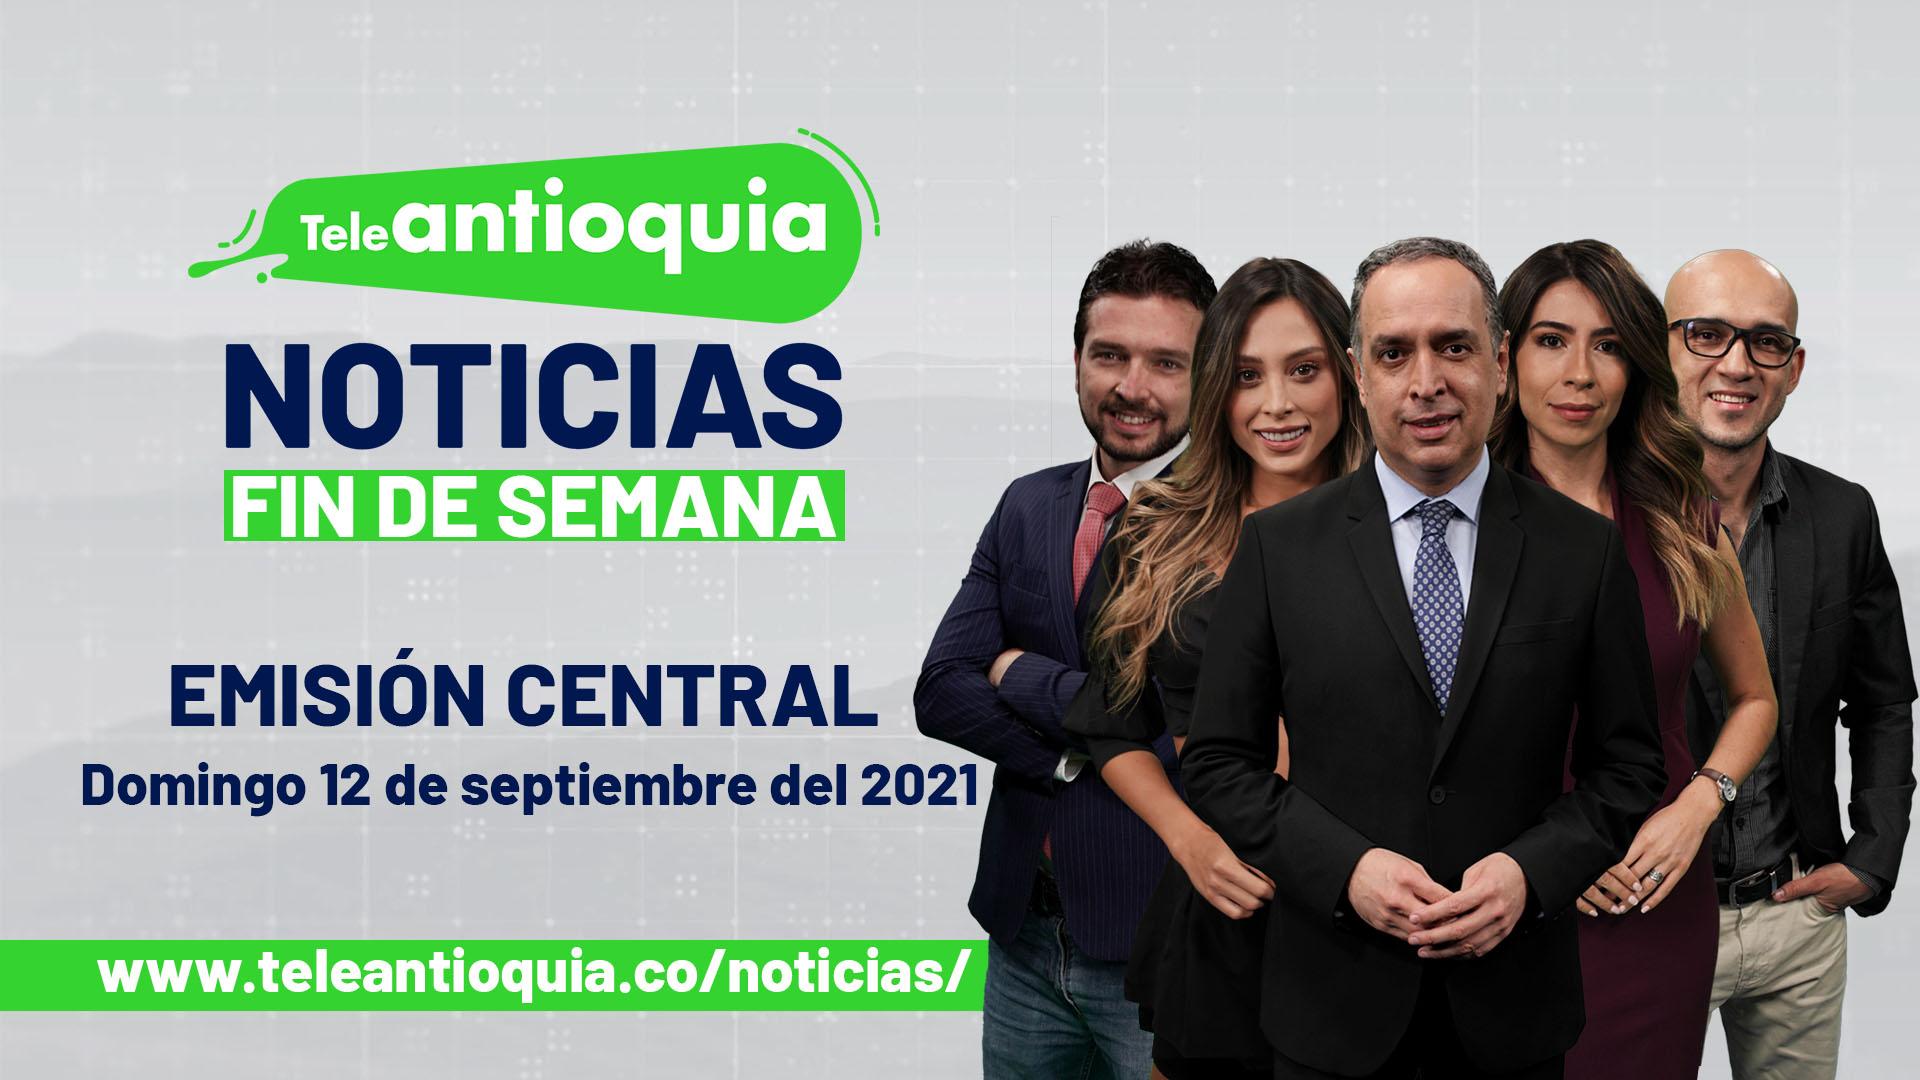 Teleantioquia Noticias - domingo 12 de septiembre de 2021 noche